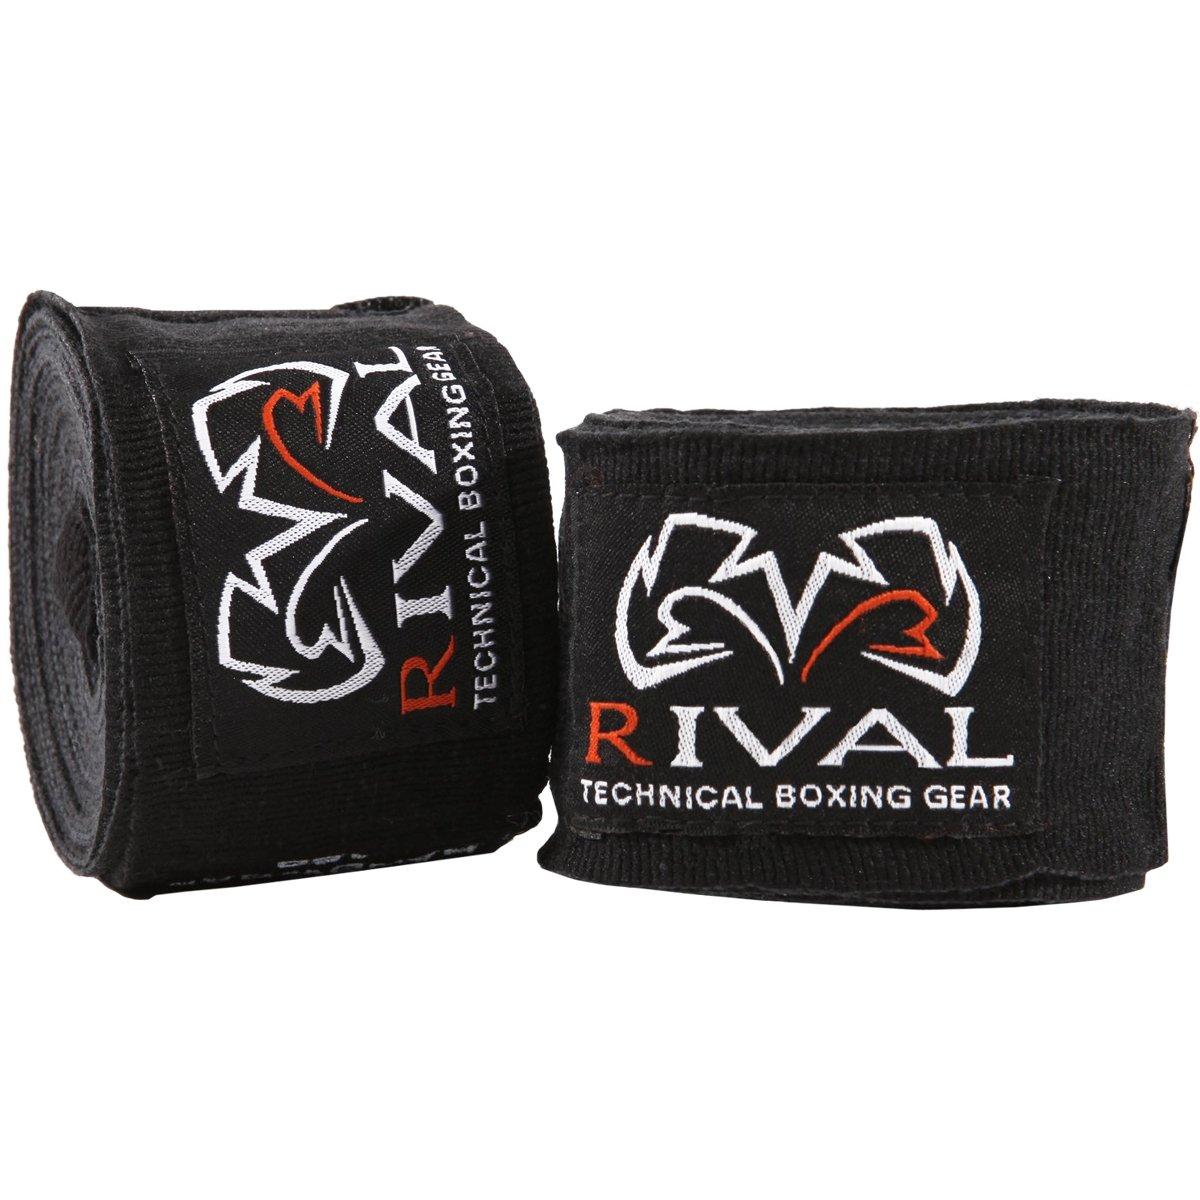 Rival Boxing 180 Rival